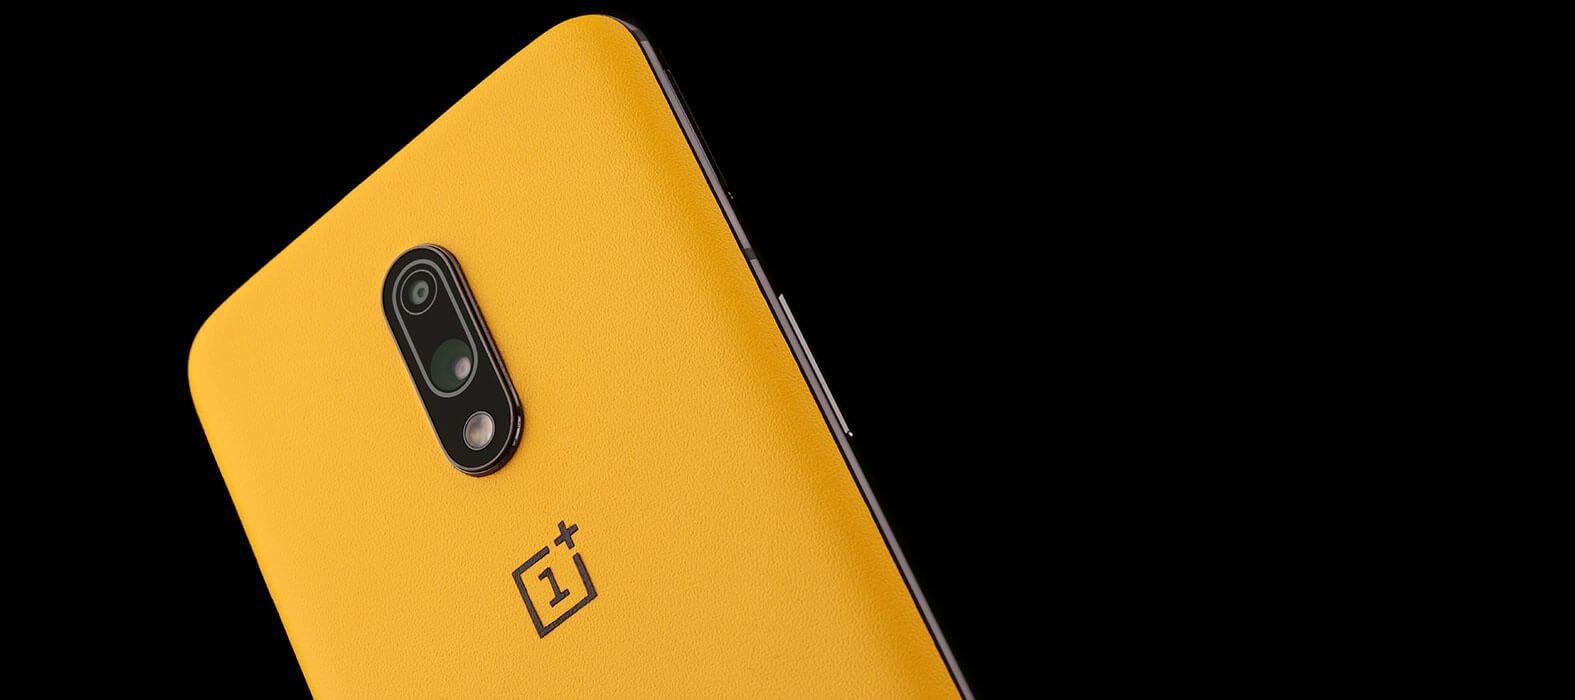 OnePlus 7 Yellow Sandstone Skins